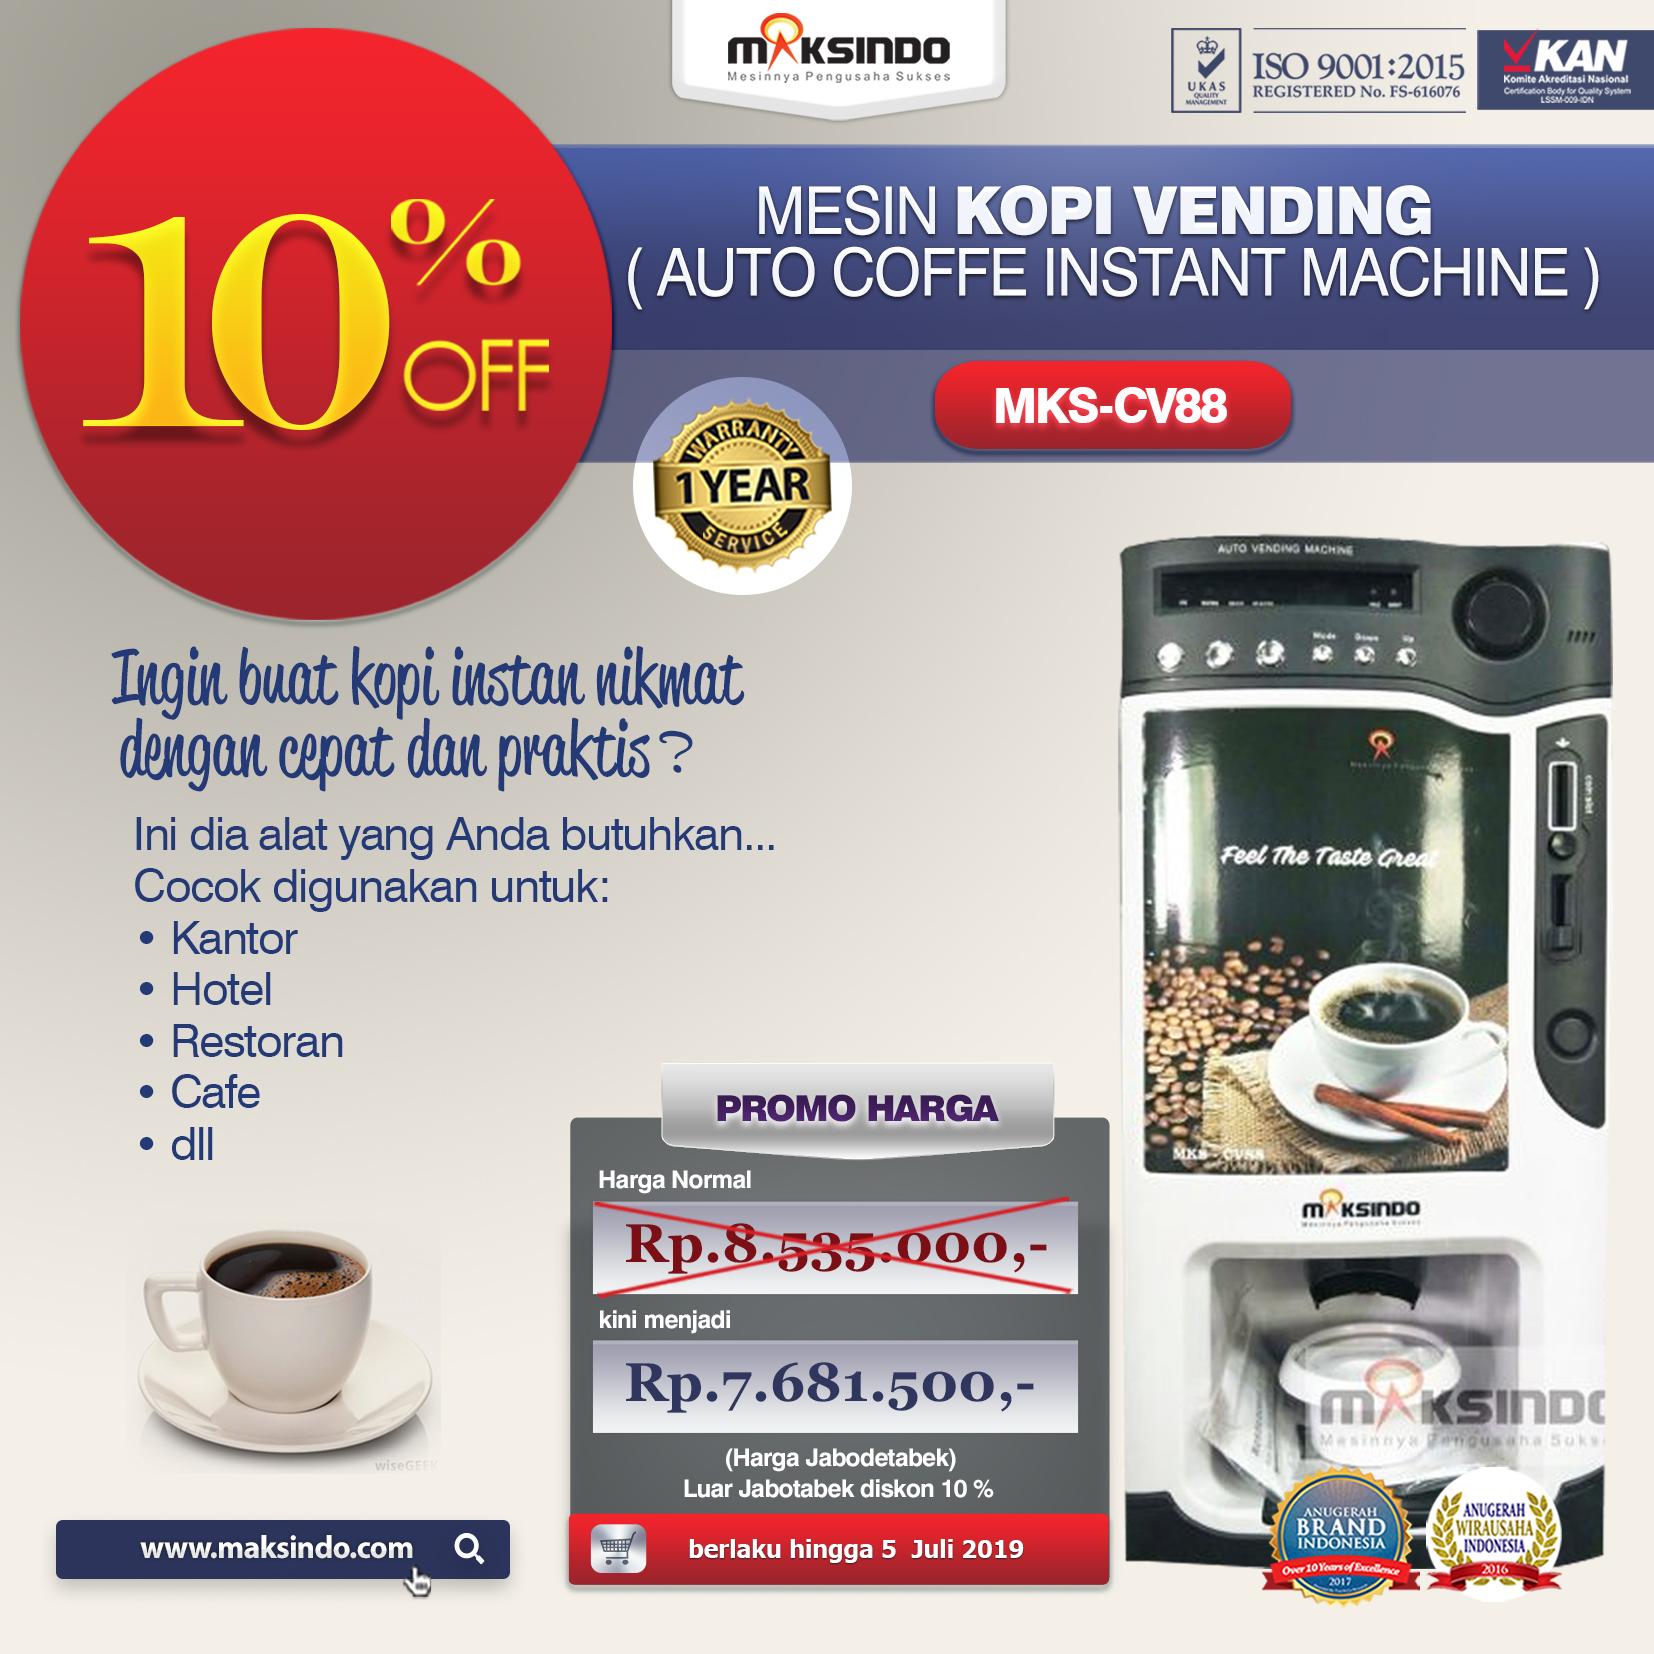 MKS CV88 Mesin Kopi Vending ( Auto coffe instant machine )